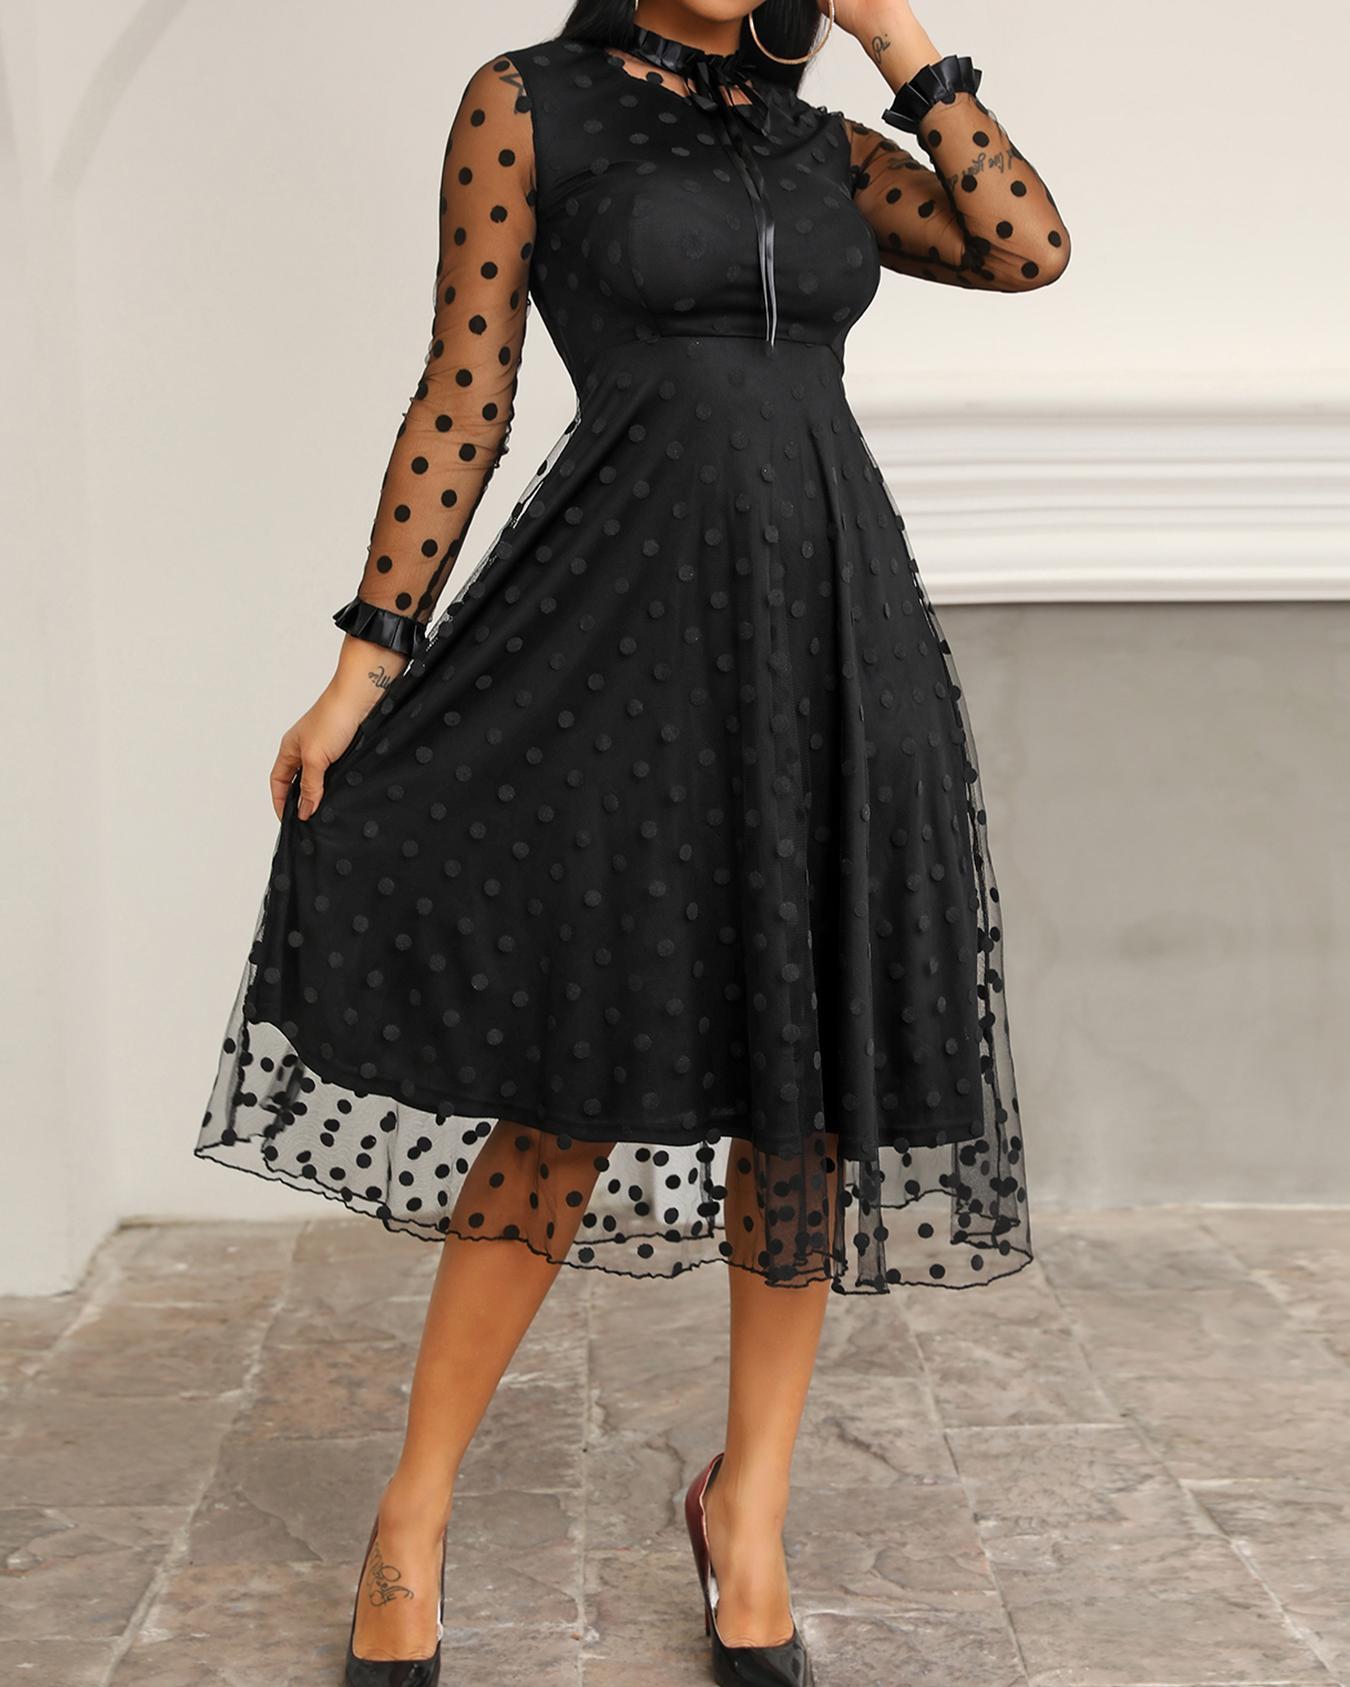 boutiquefeel / Vestido de manga larga de malla pura polka dot